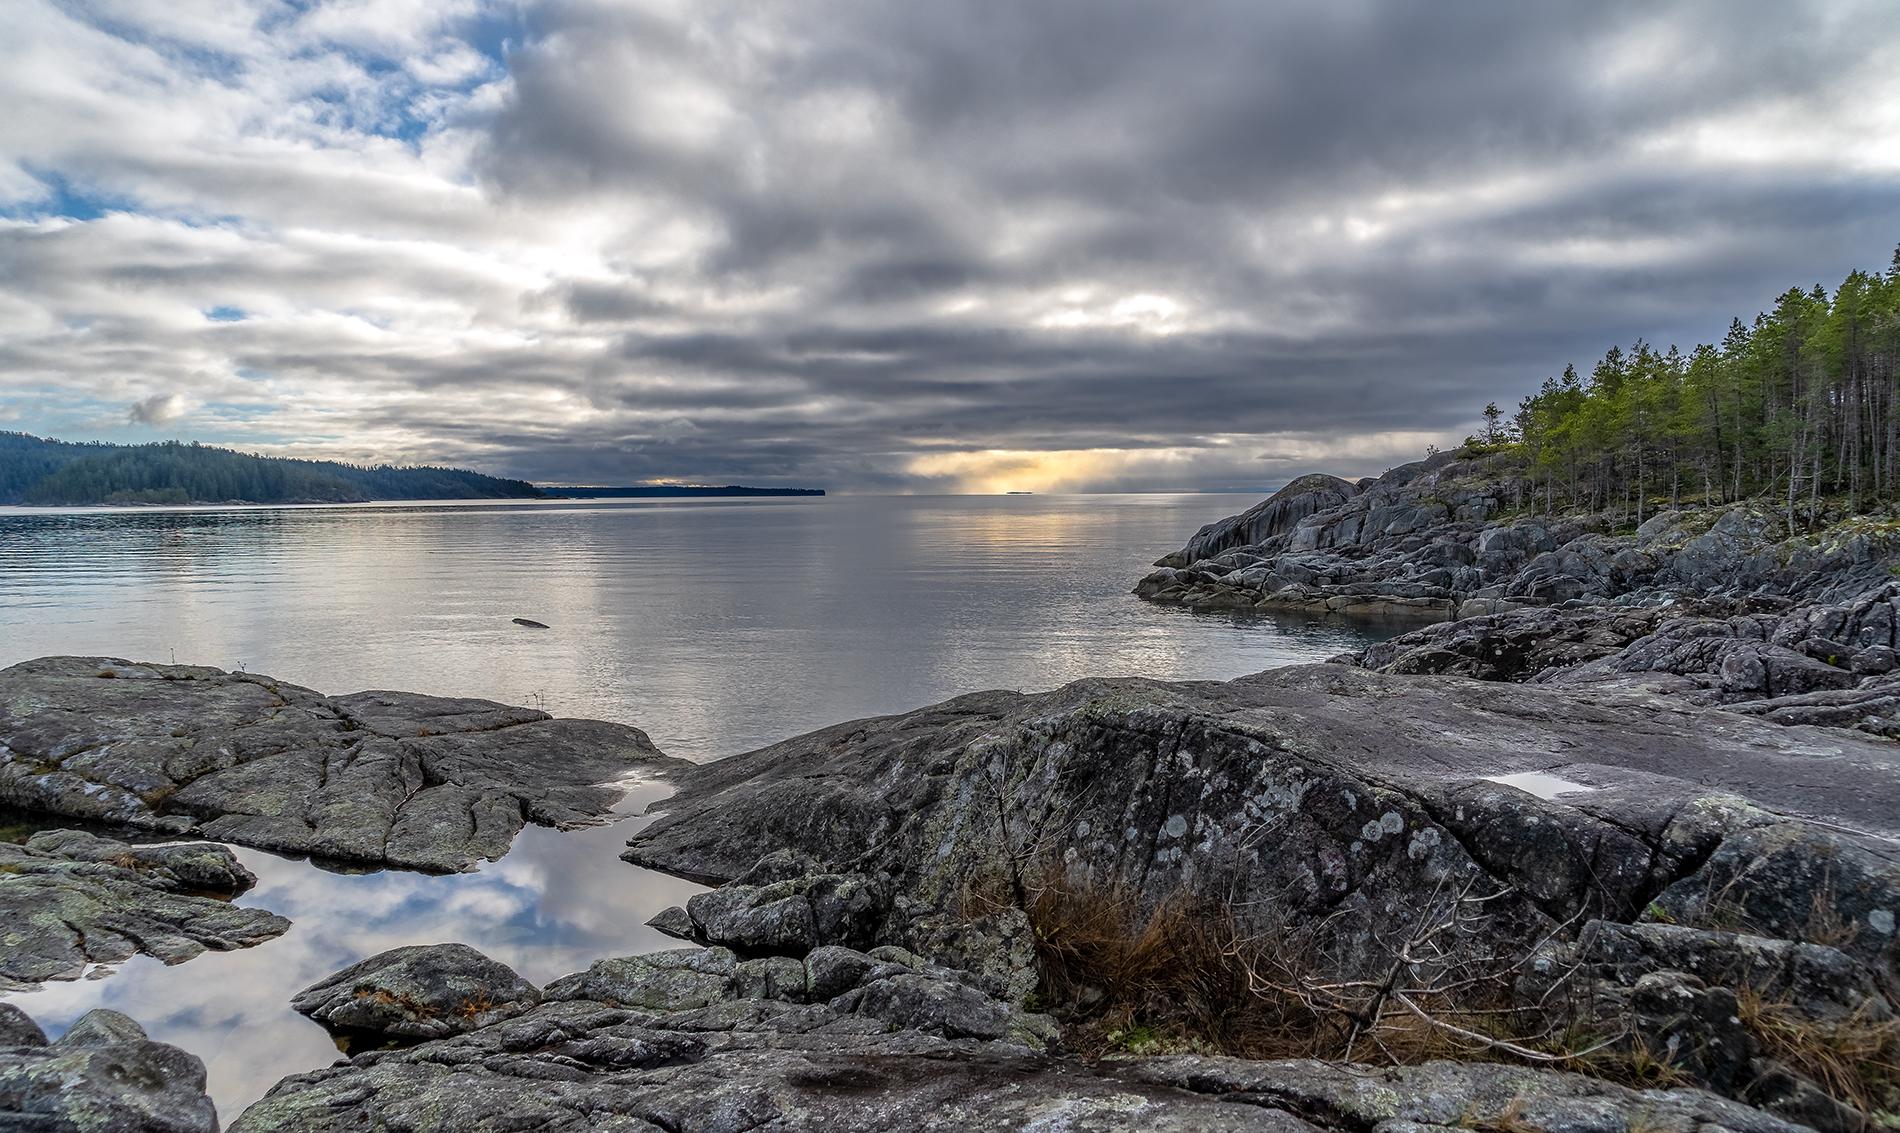 The view from Shellaligan Pass Trail on Quadra Island